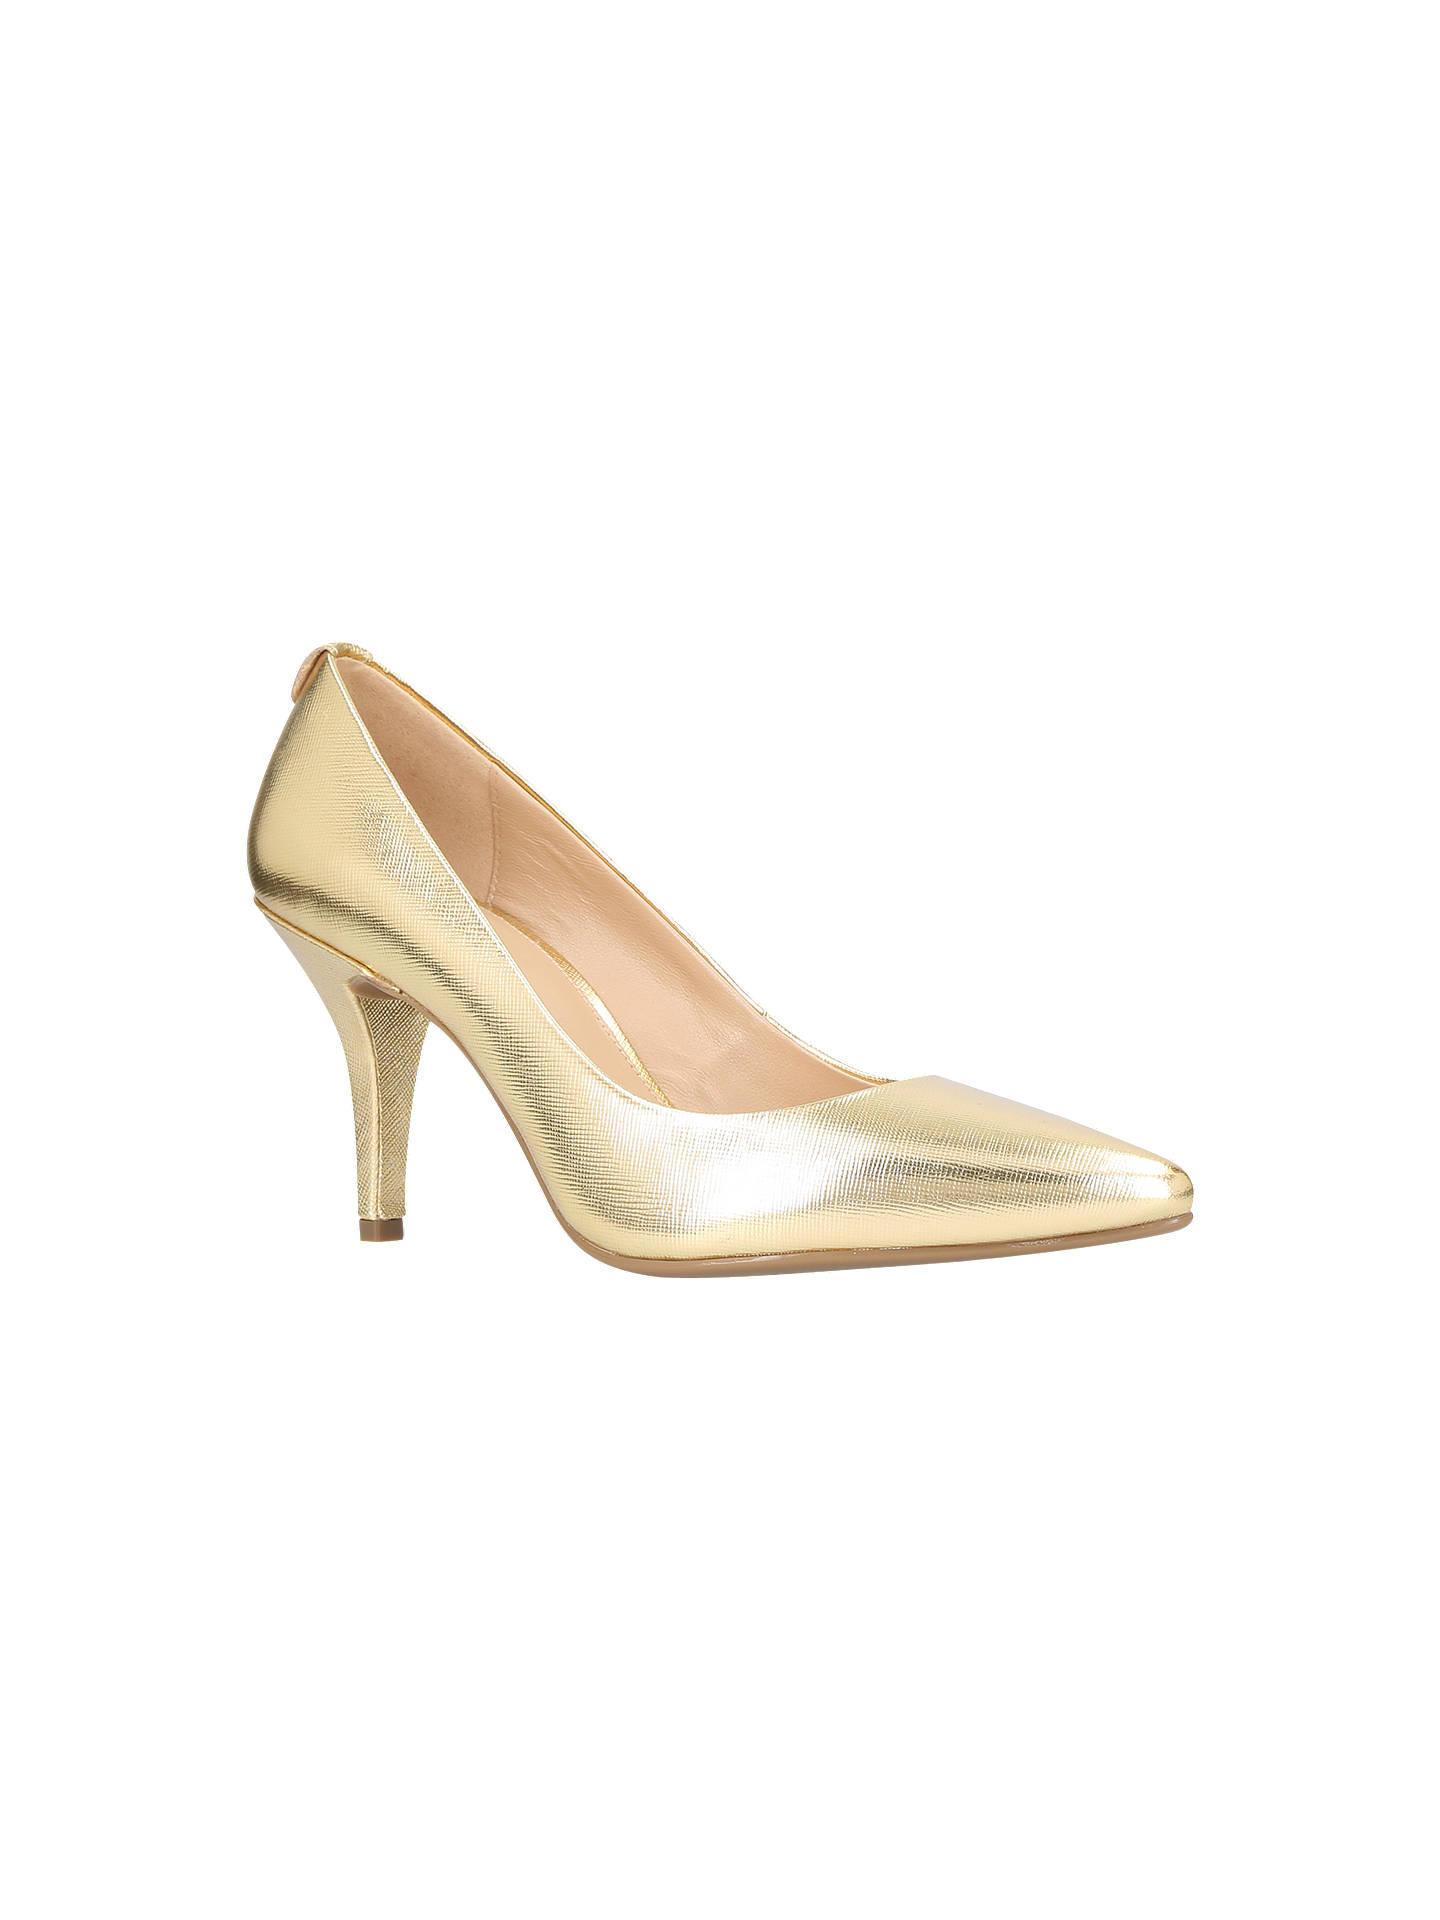 aa68fcbe3b5 MICHAEL Michael Kors Flex Pump Court Shoes, Gold Leather at John ...